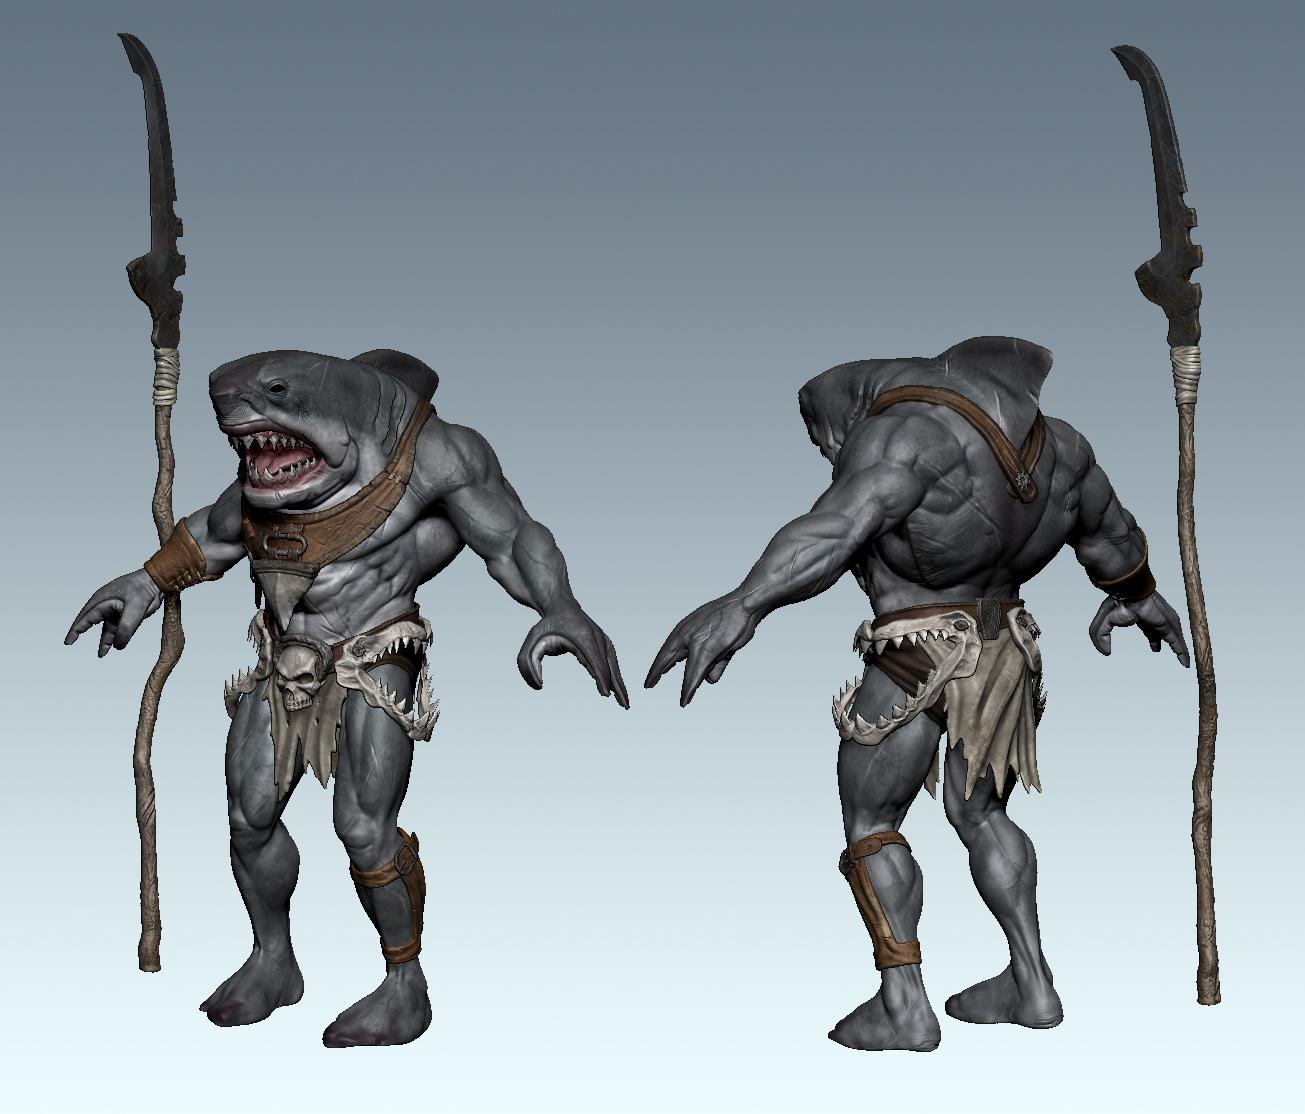 shark human hybrid